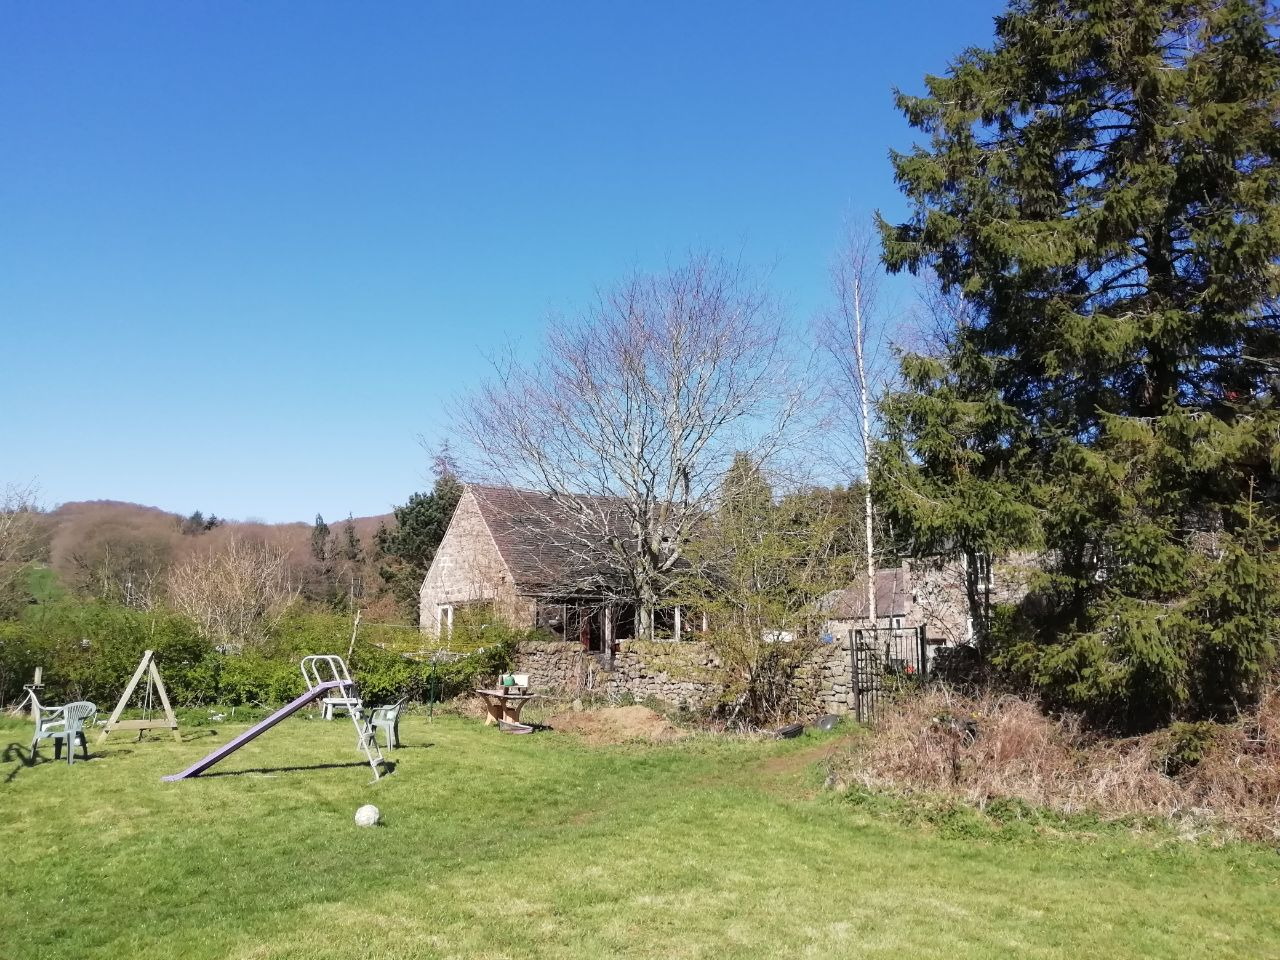 Field garden